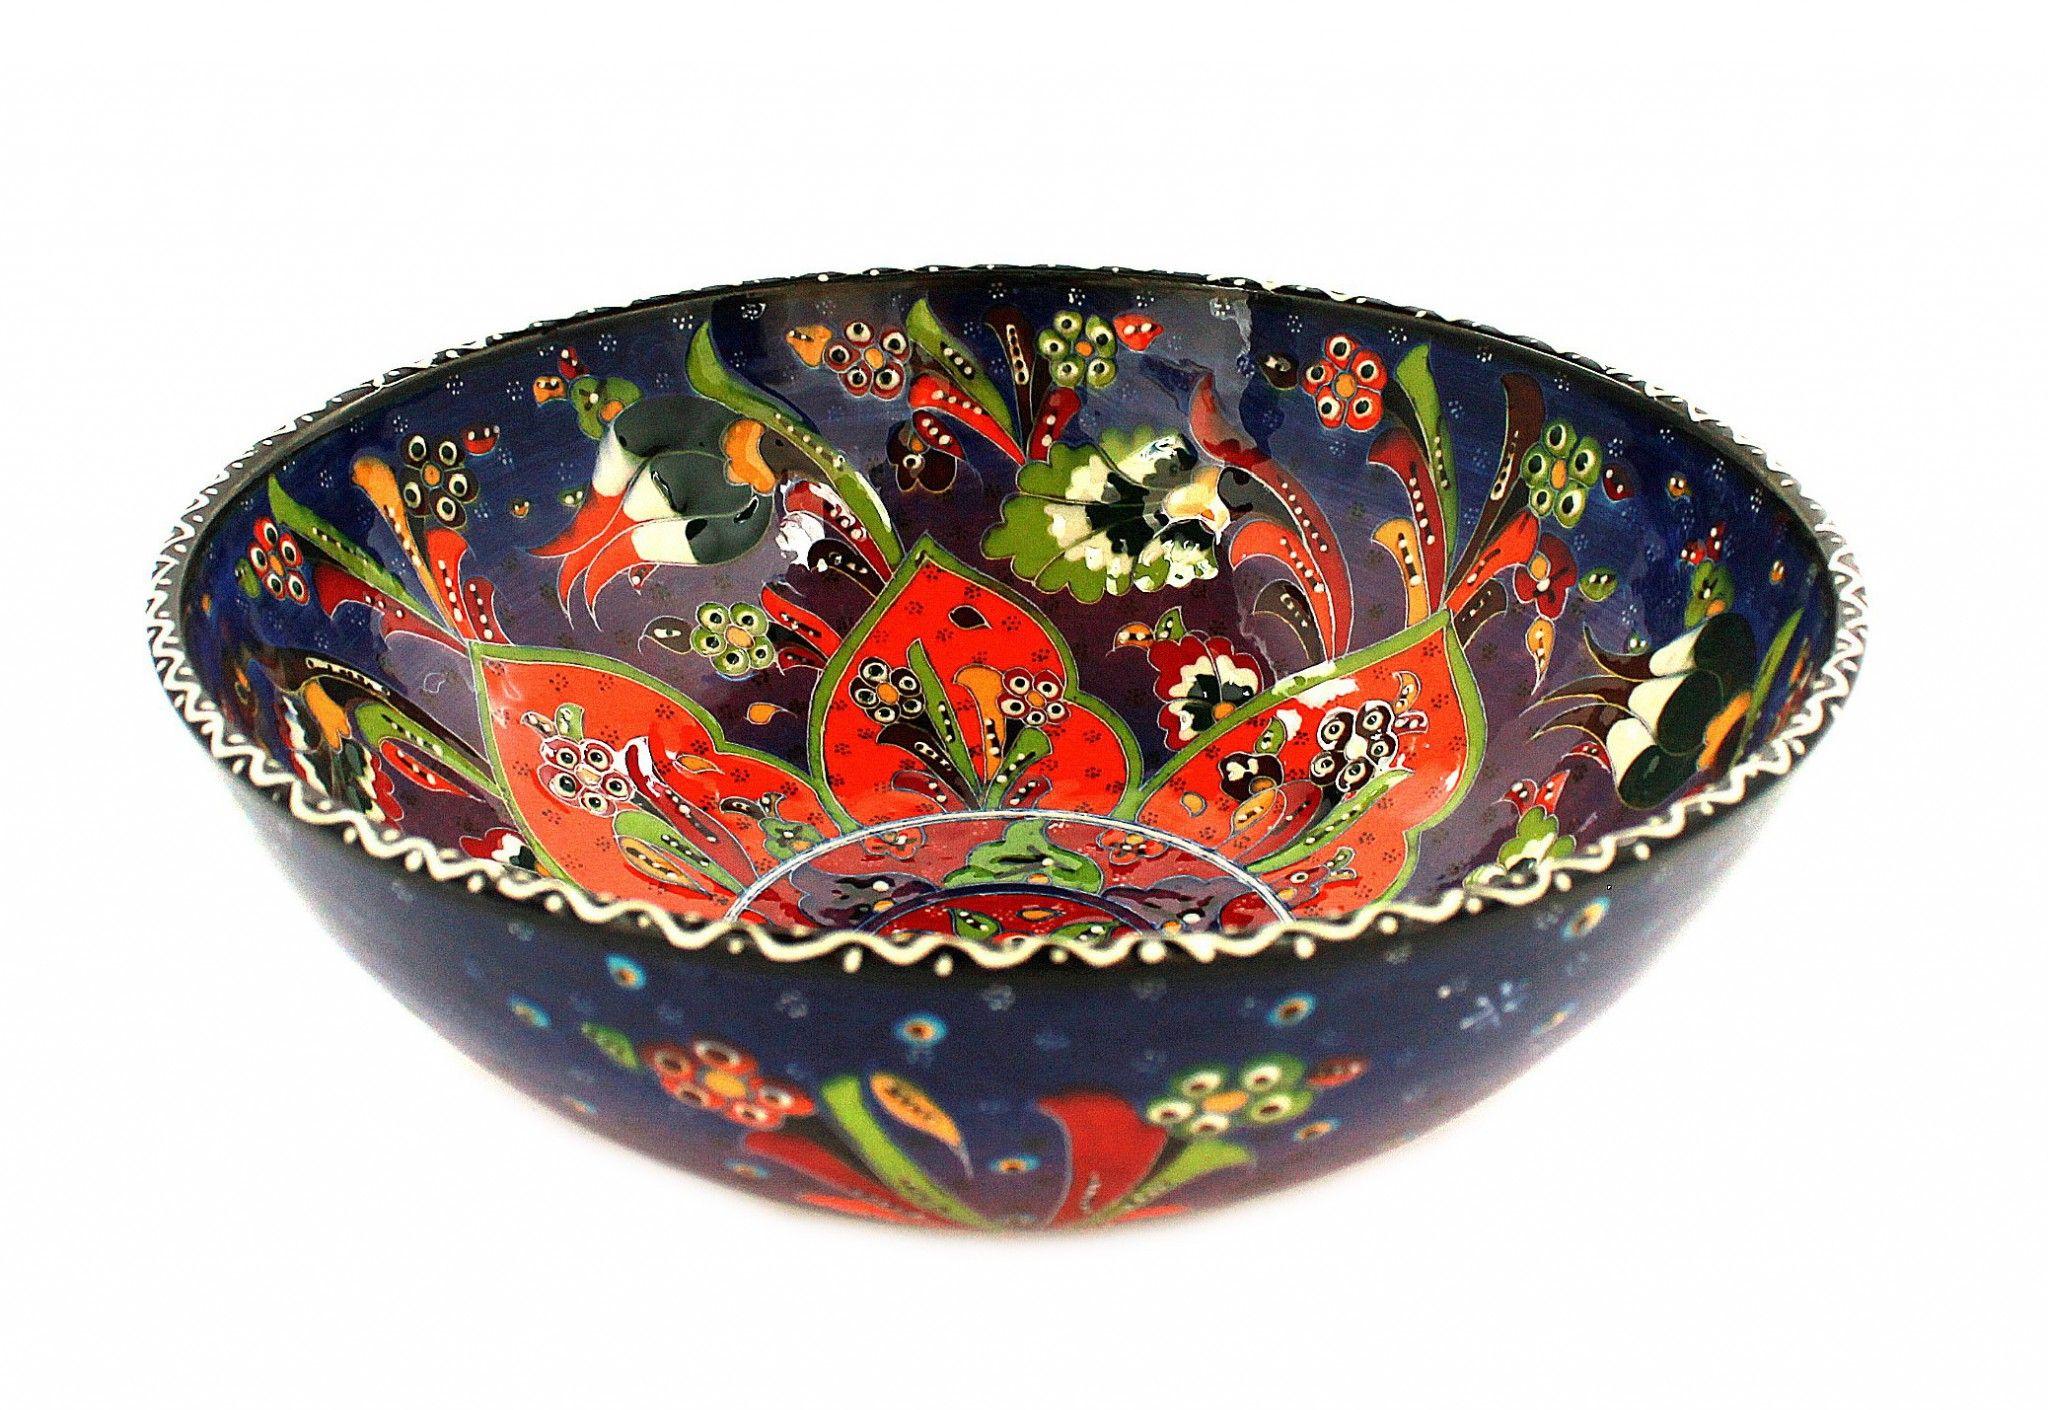 Aus Was Besteht Keramik aus was besteht keramik ulla keramik aus was besteht keramik das